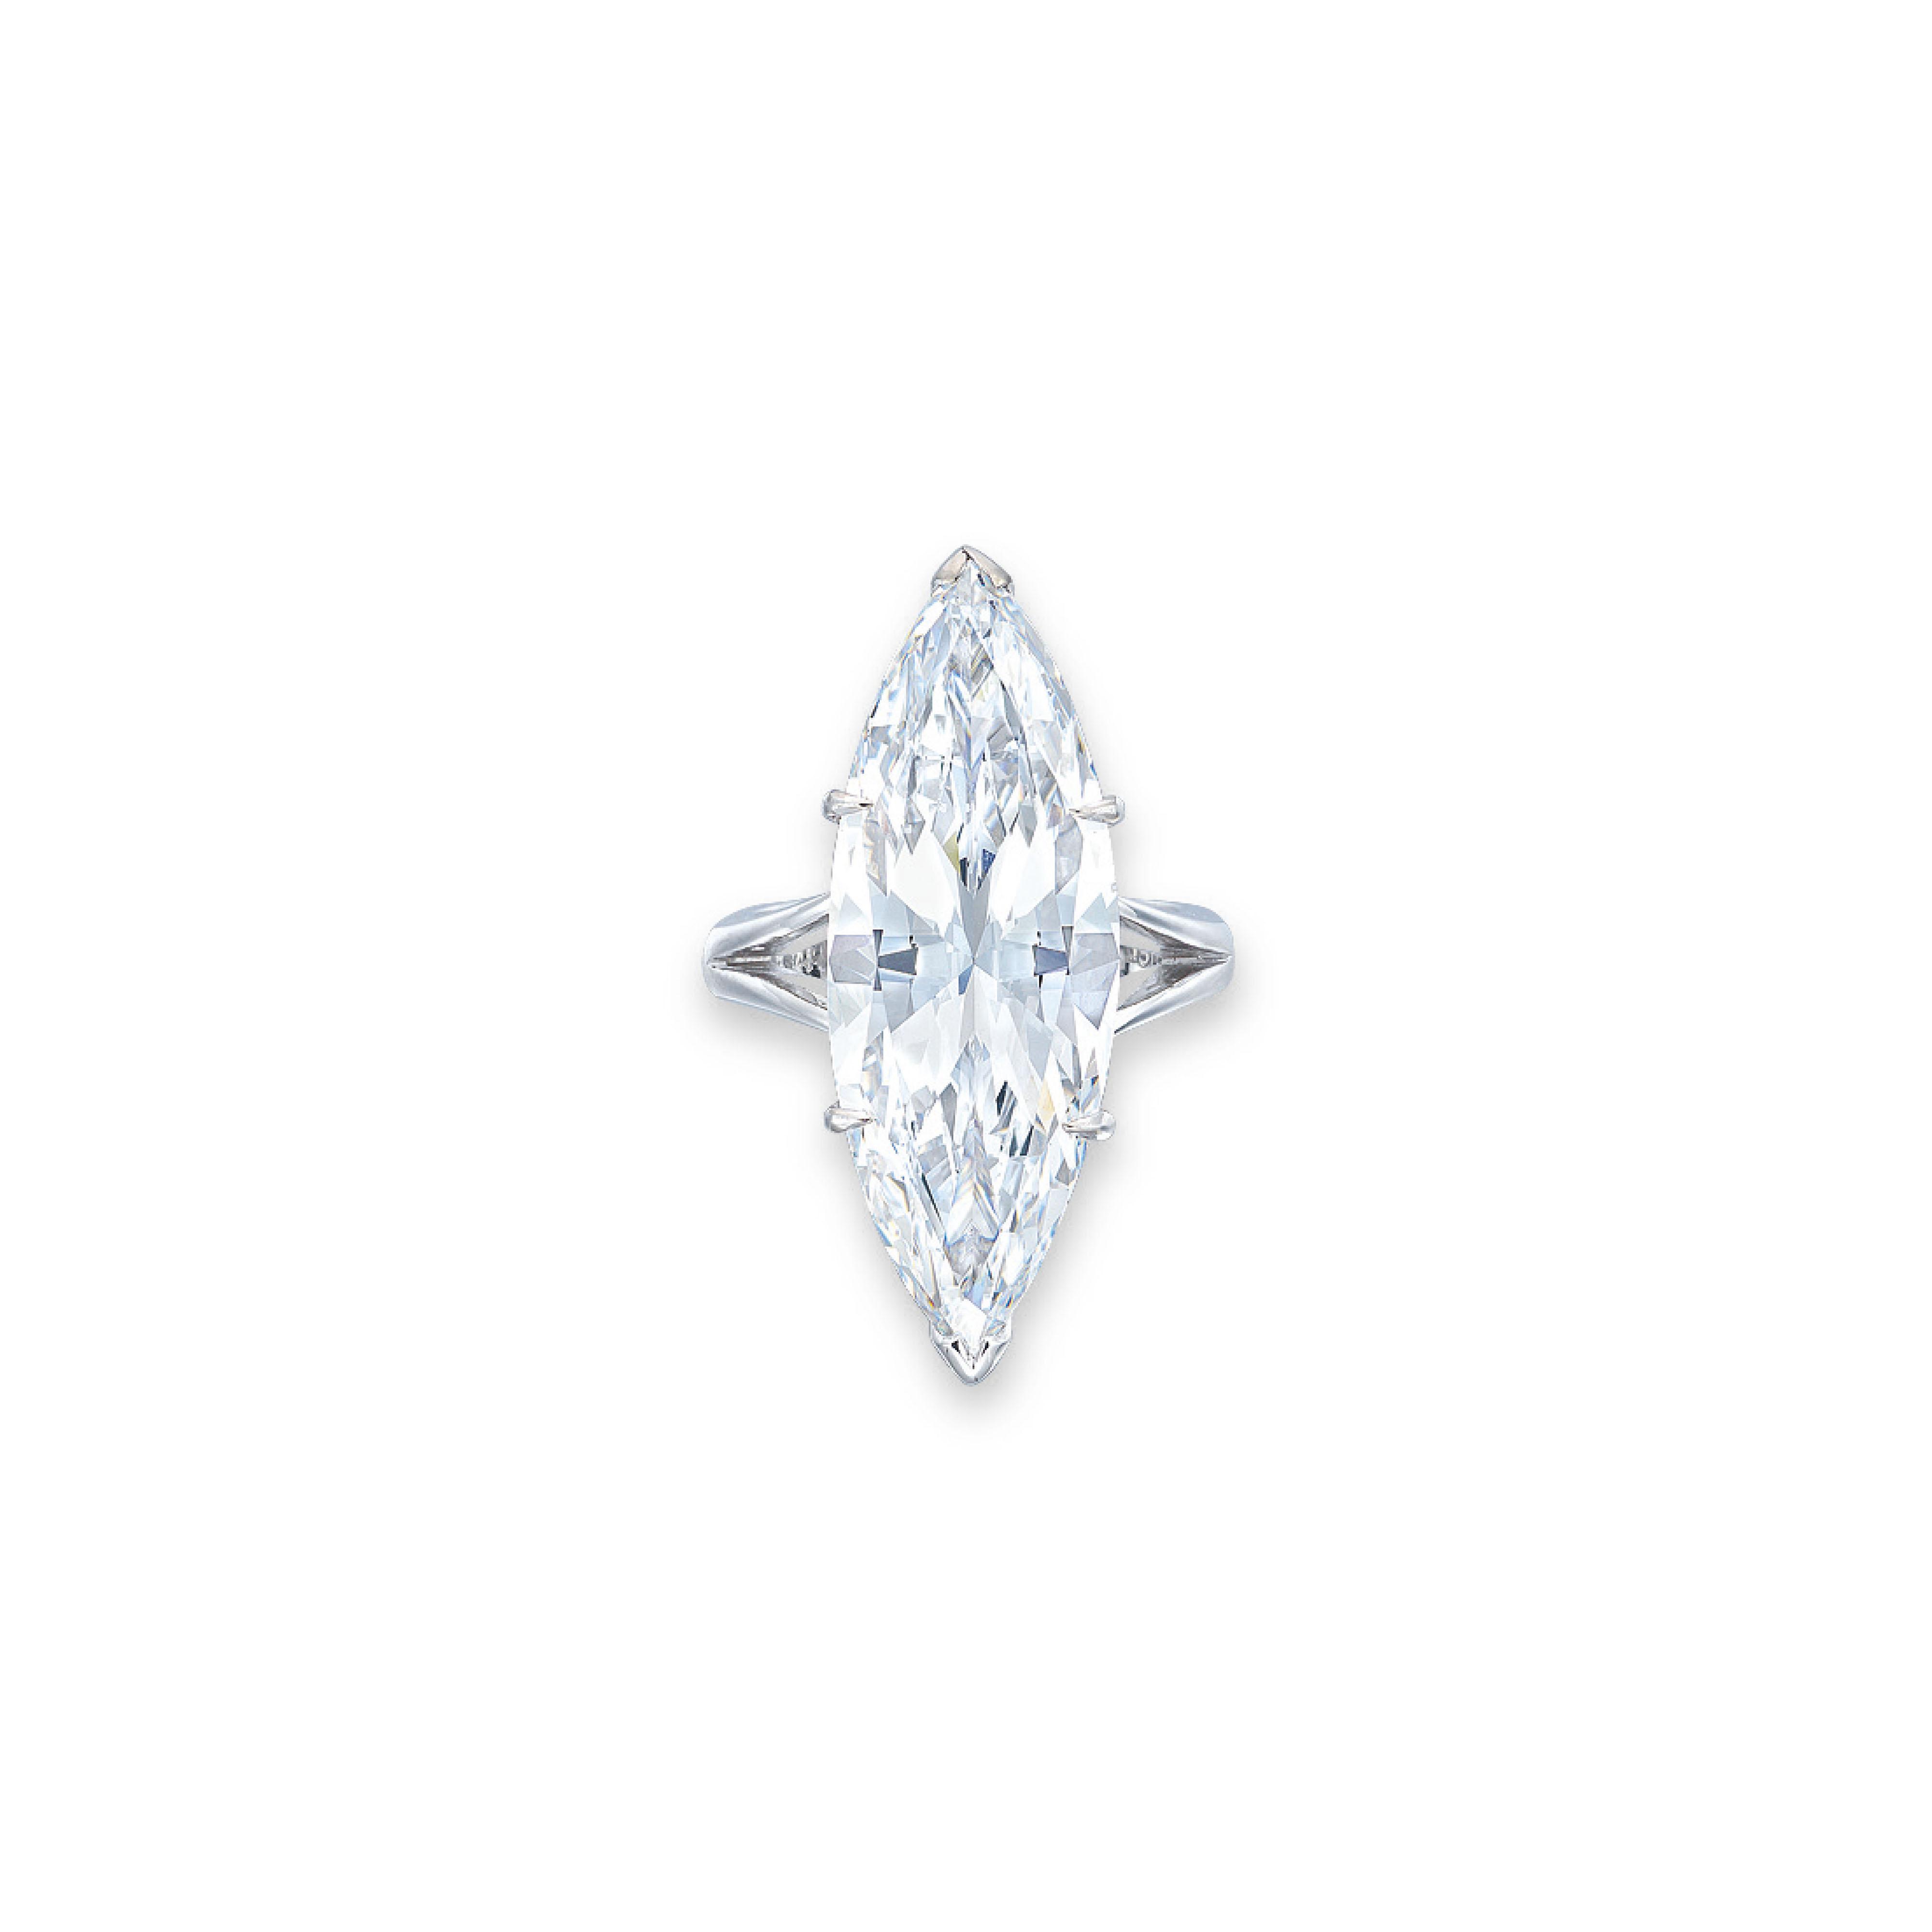 AN IMPORTANT DIAMOND RING, BY SIBA